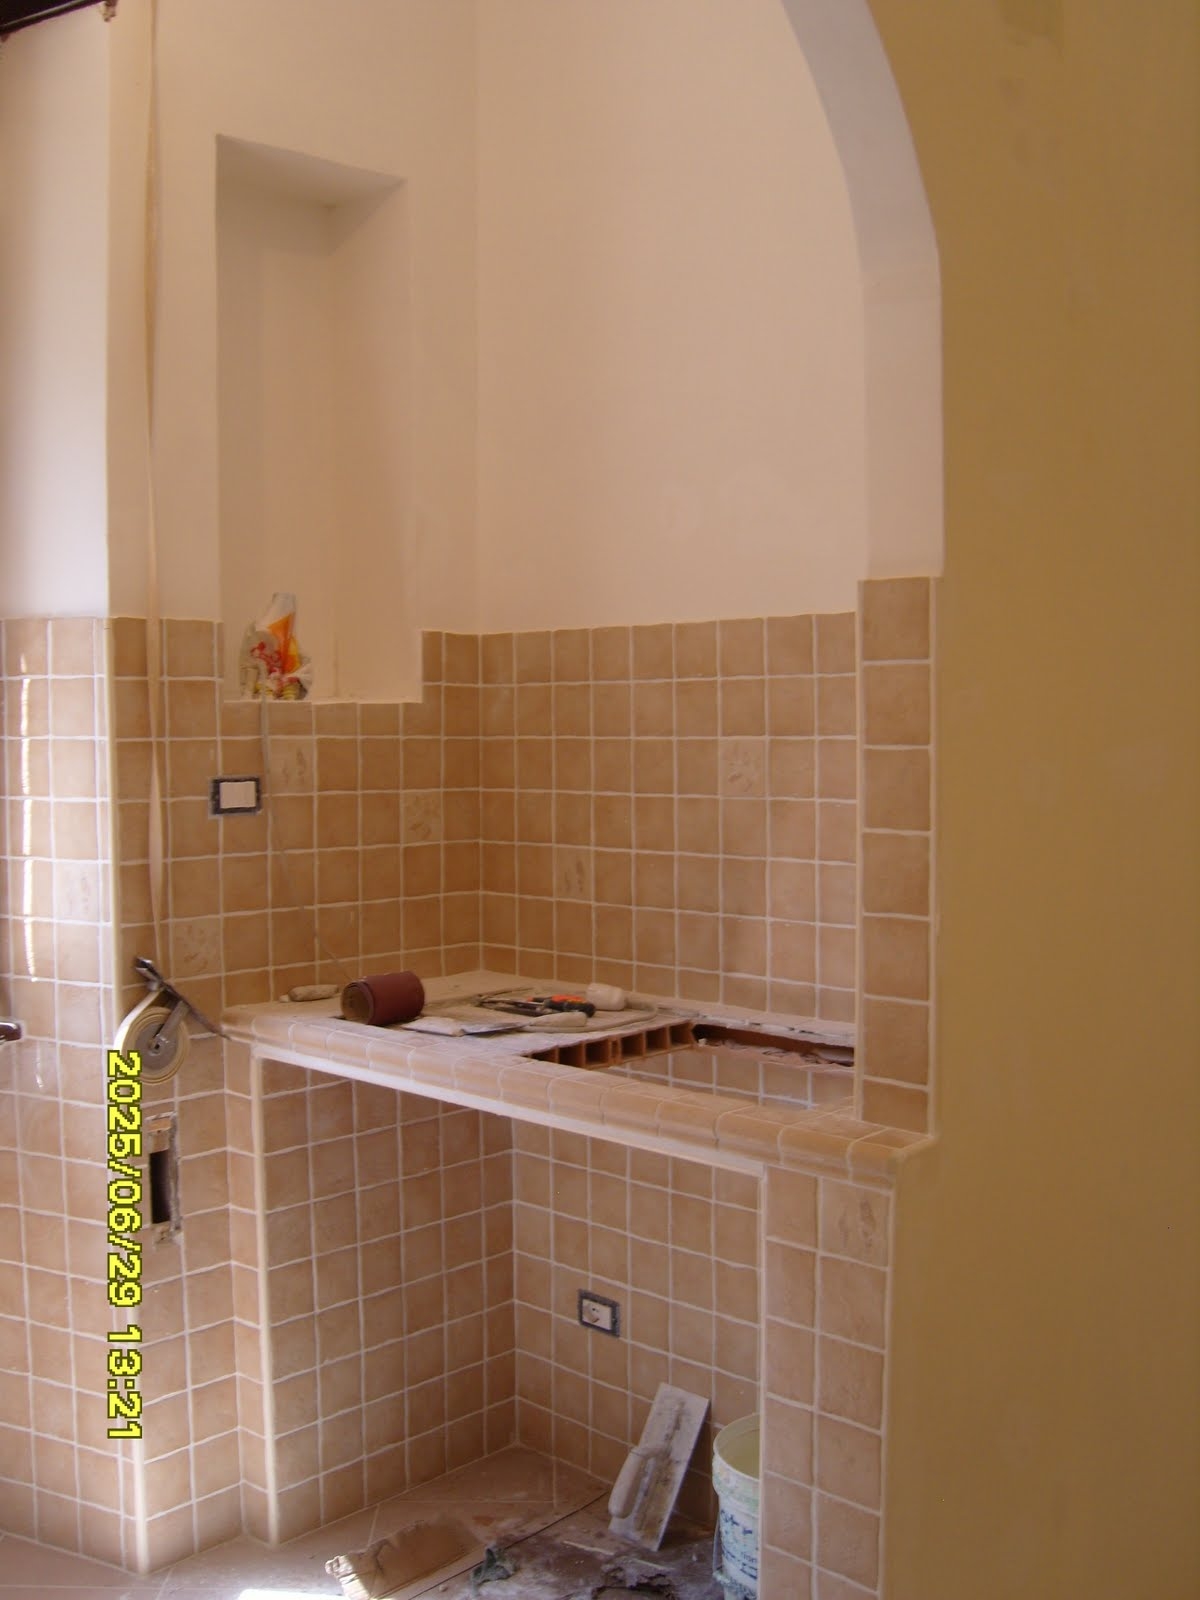 Cucina completa ristorante costo cucina in muratura costo cucine in muratura with cucina - Costo cucina in muratura ...